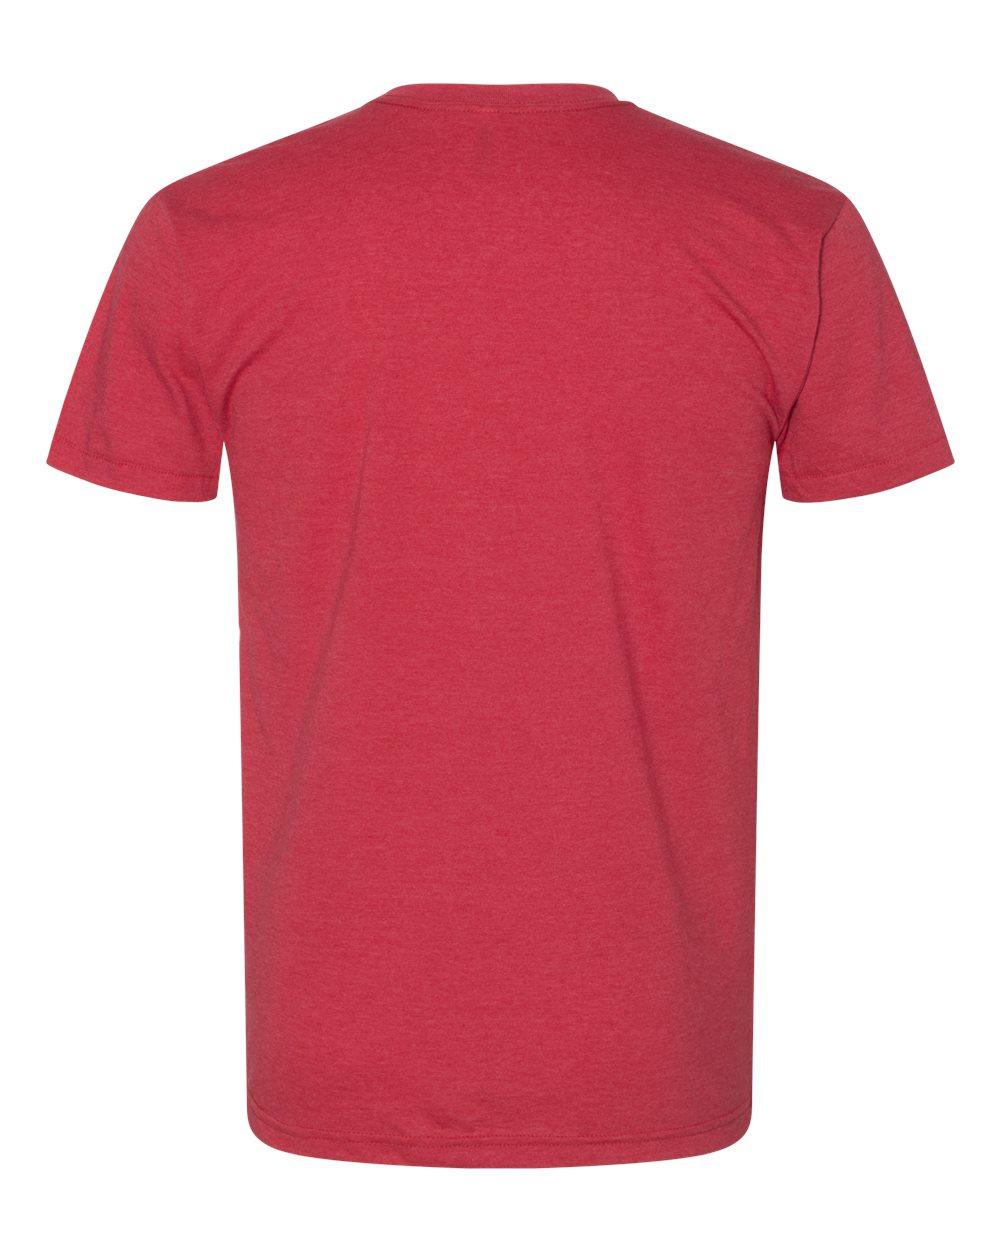 American-Apparel-Mens-Slim-Fit-50-50-Cotton-T-Shirt-Tee-BB401W-up-to-2XL thumbnail 37